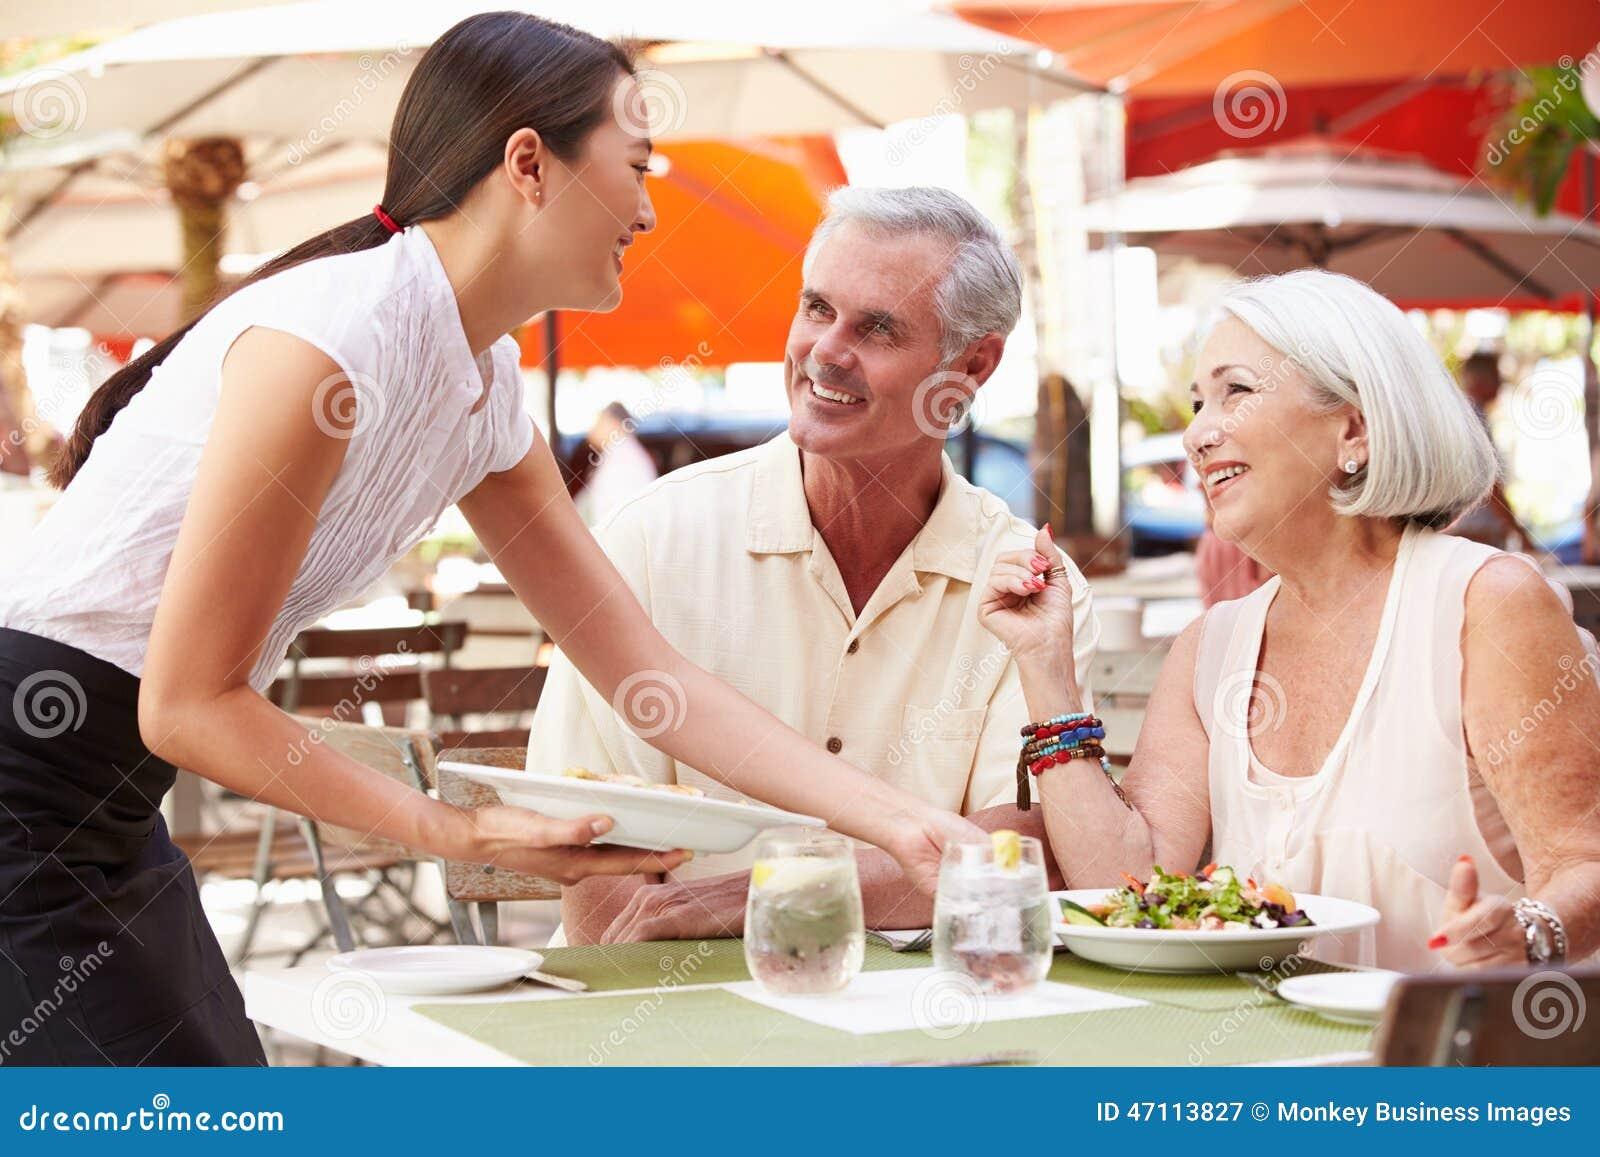 Waitress Serving Senior Couple Lunch In Outdoor Restaurant